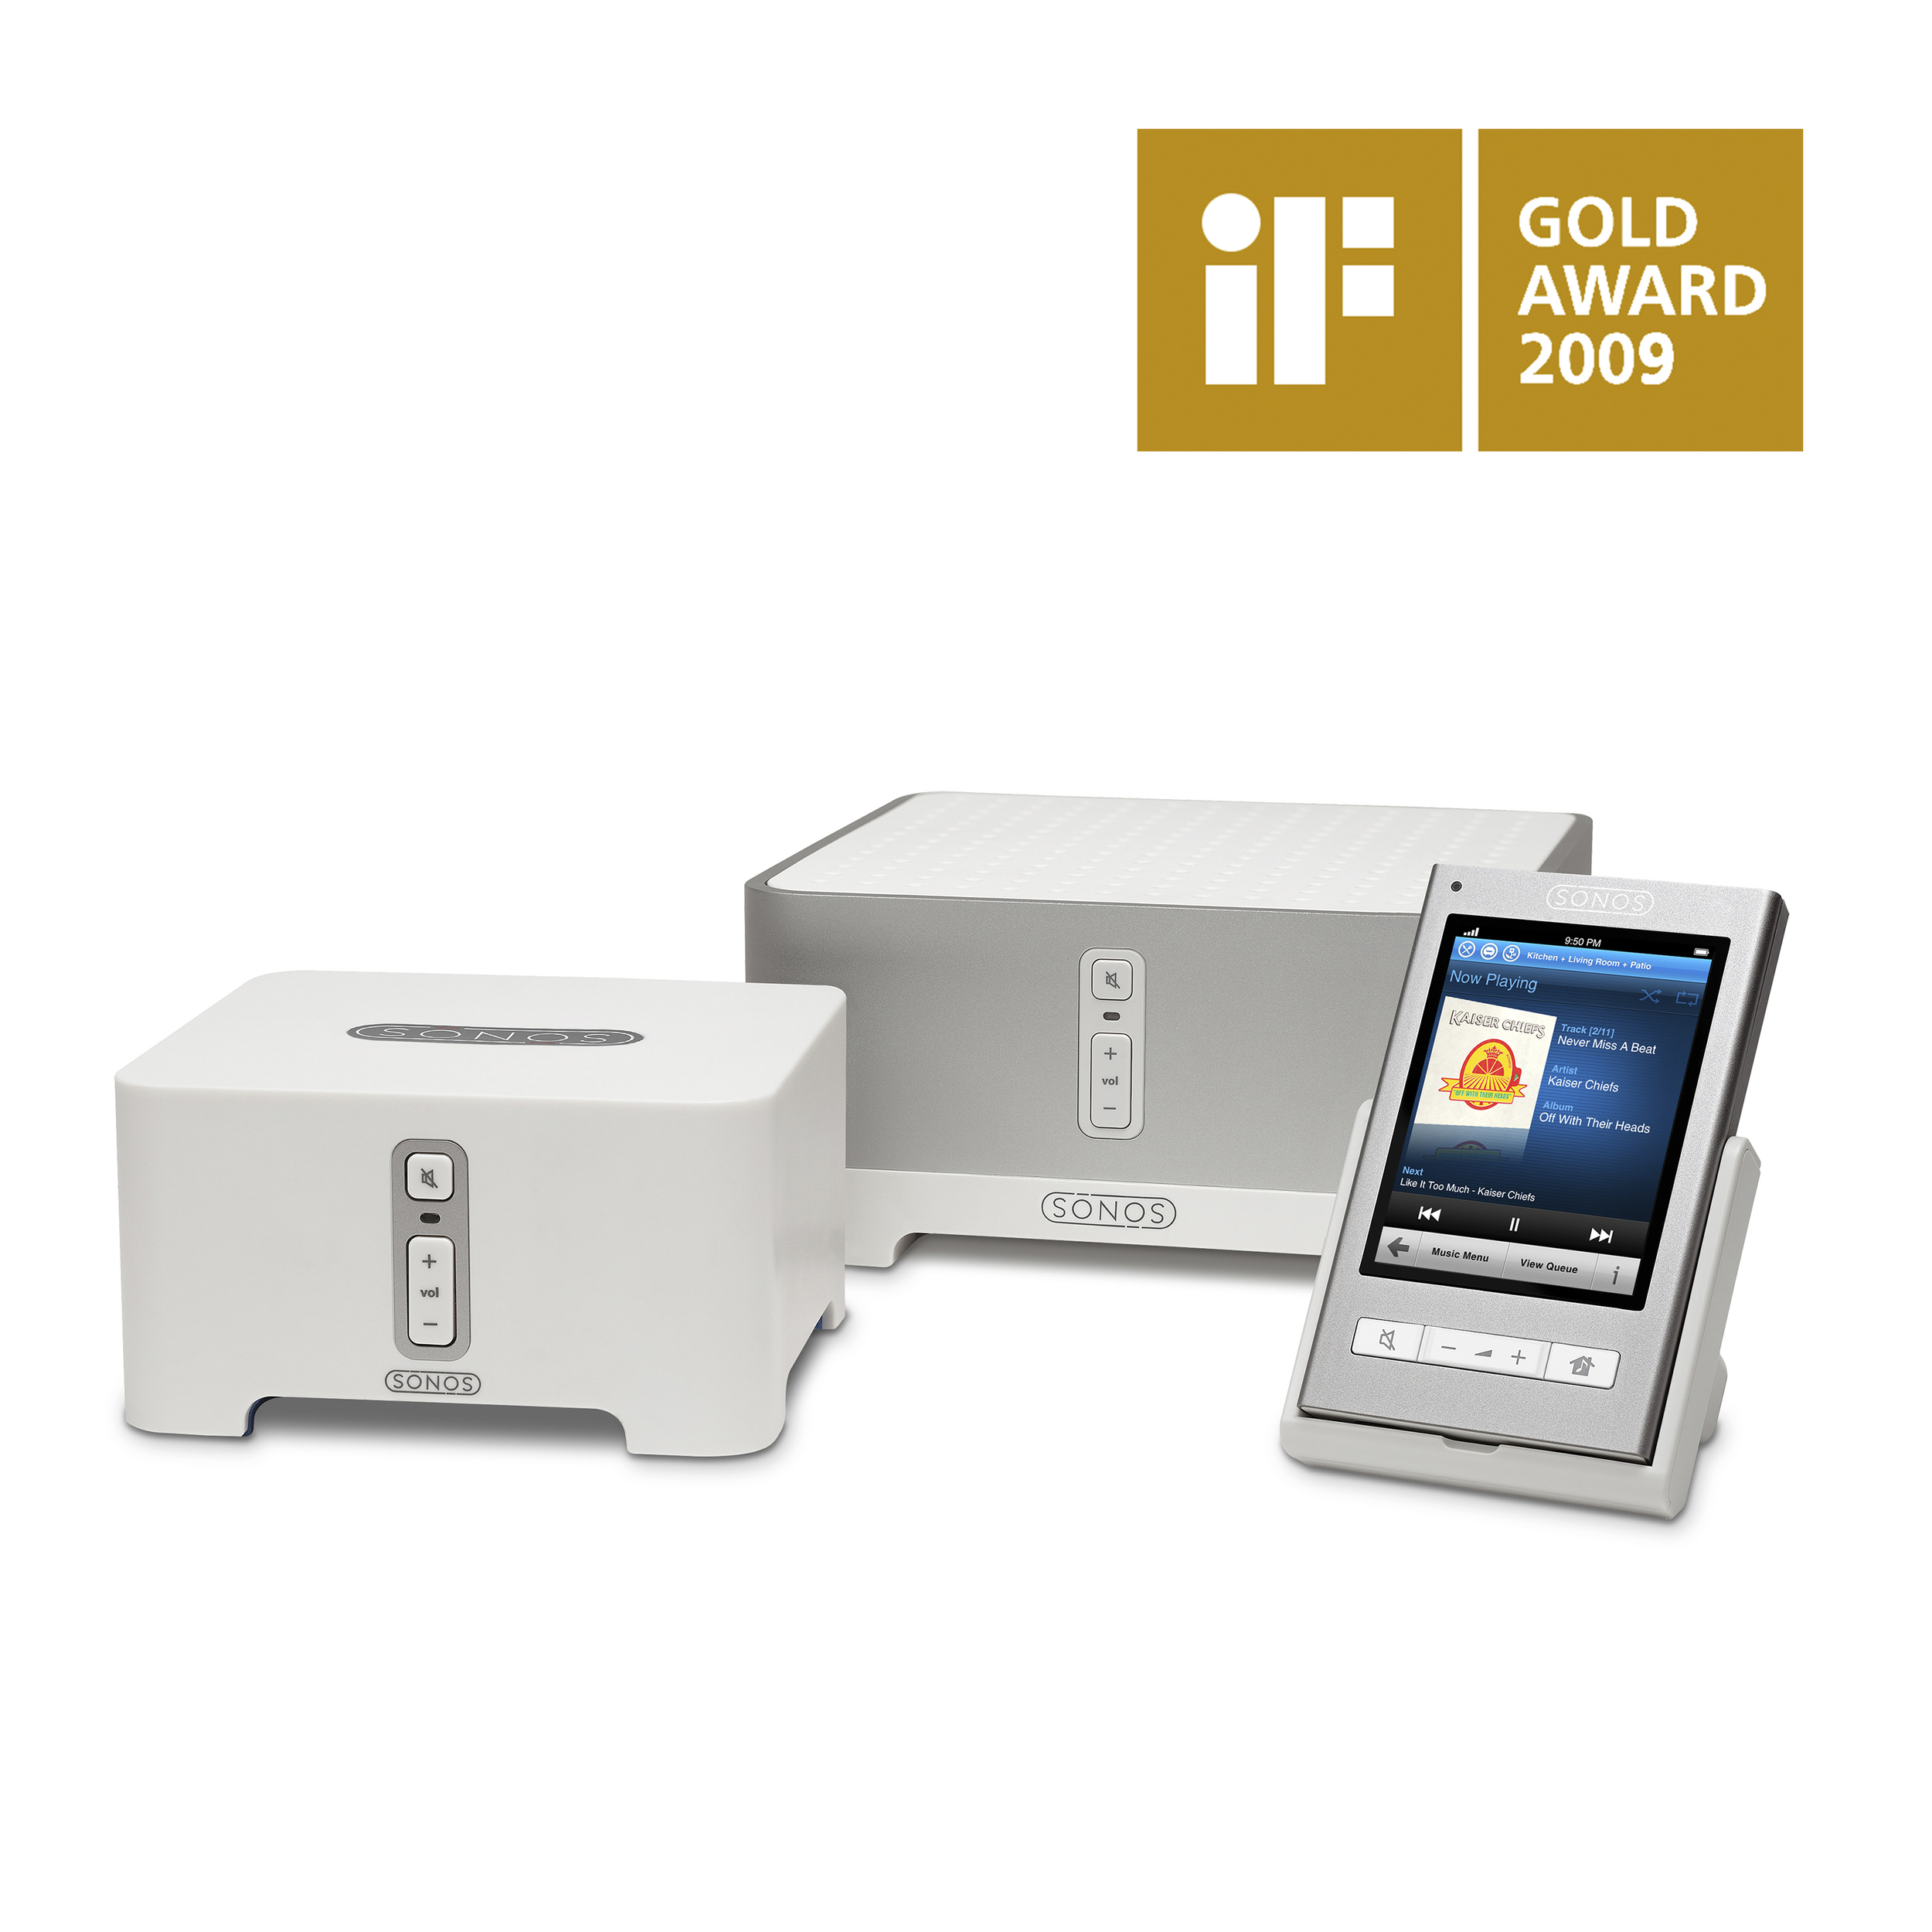 Sonos Multi-Room Music System   iF Design Award - Gold